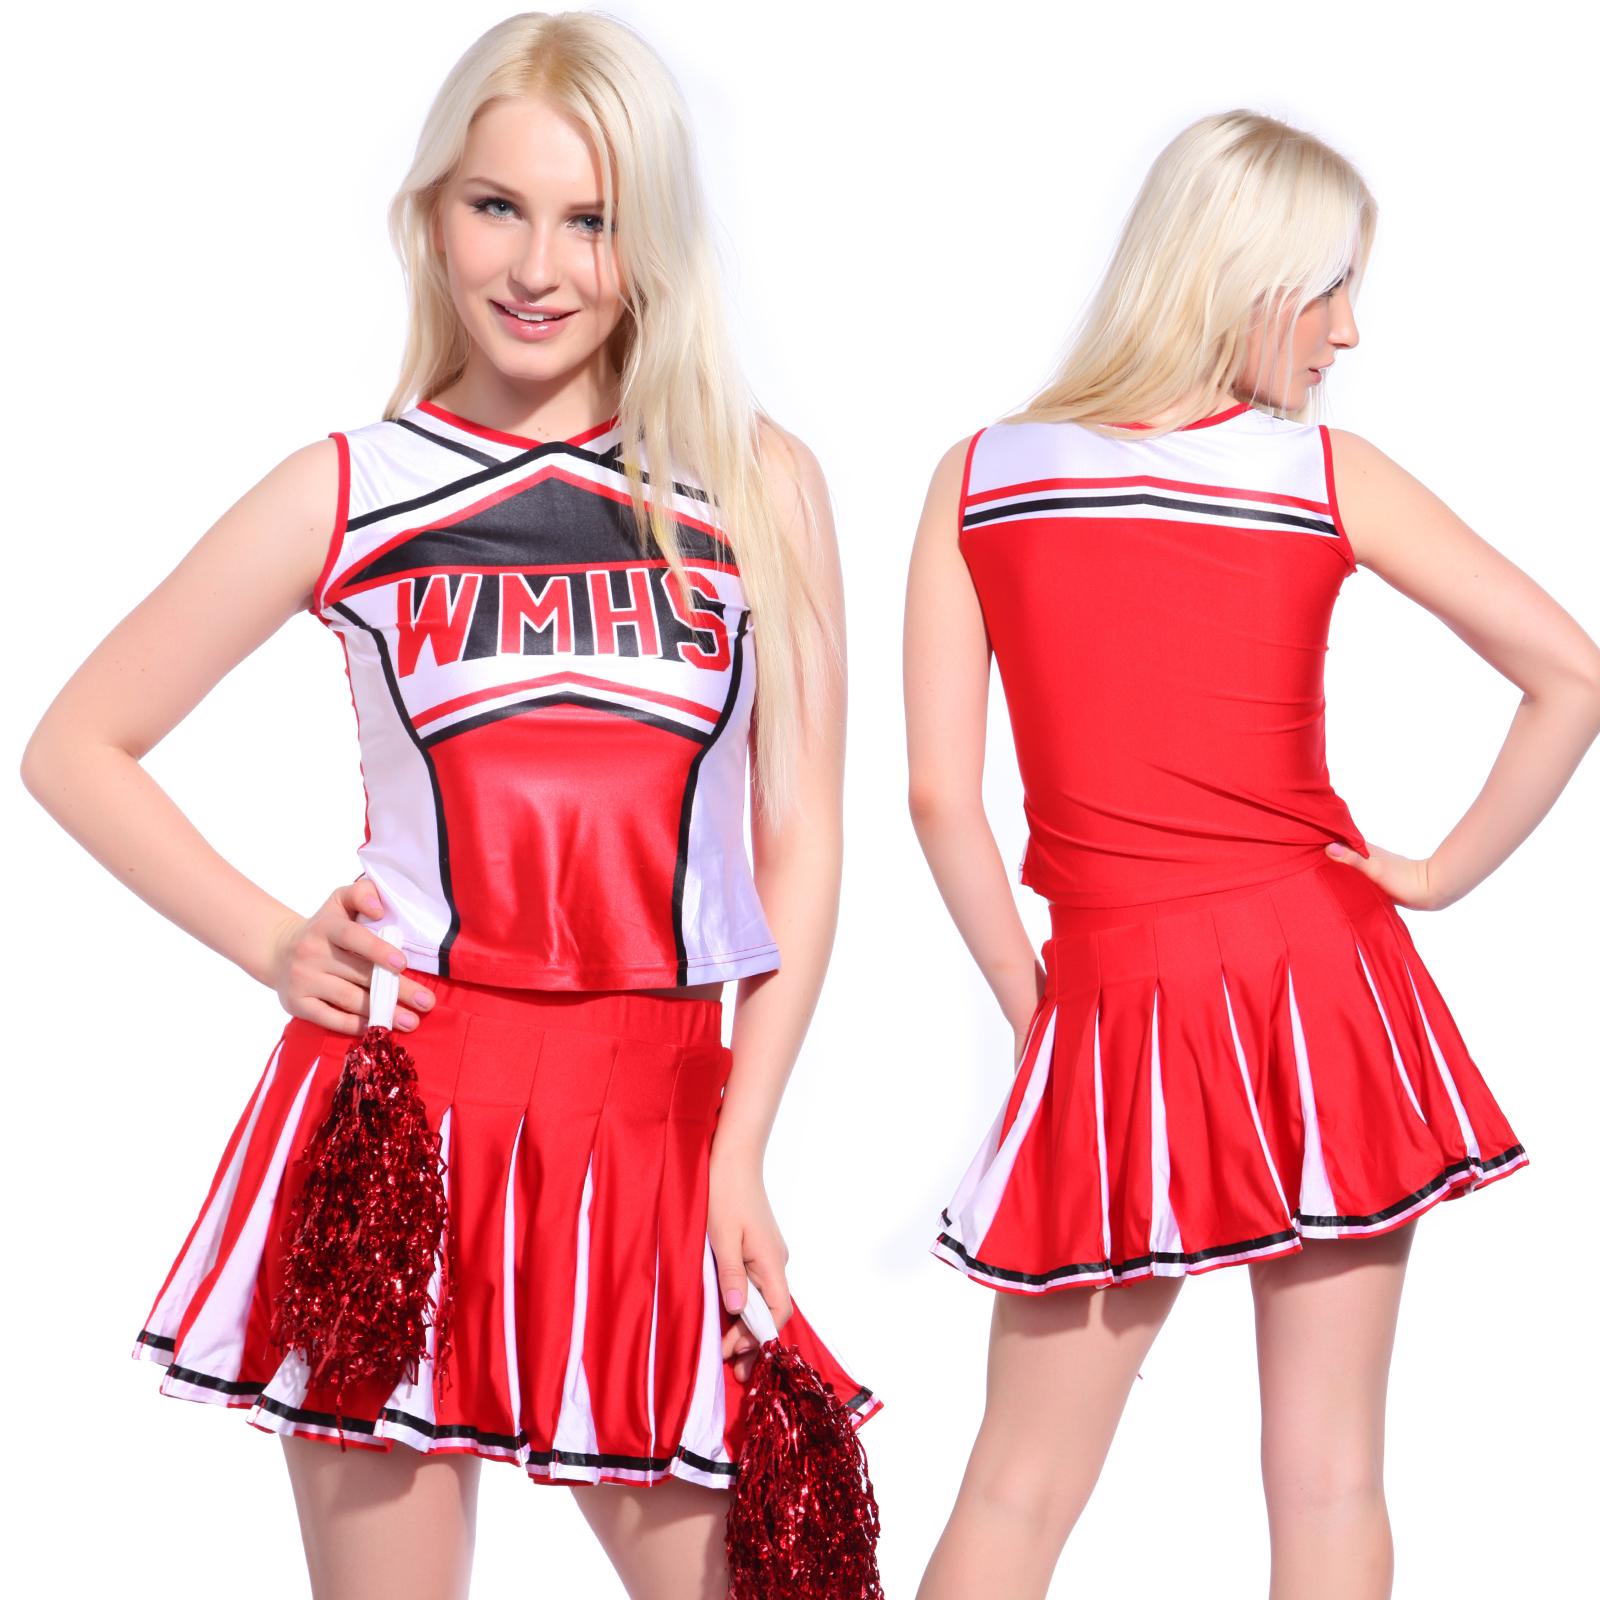 Glee Style Cheerleader Cheerios Costume Cheer Girl Cheerleading Outfit w Pompoms | eBay  sc 1 st  eBay & Glee Style Cheerleader Cheerios Costume Cheer Girl Cheerleading ...